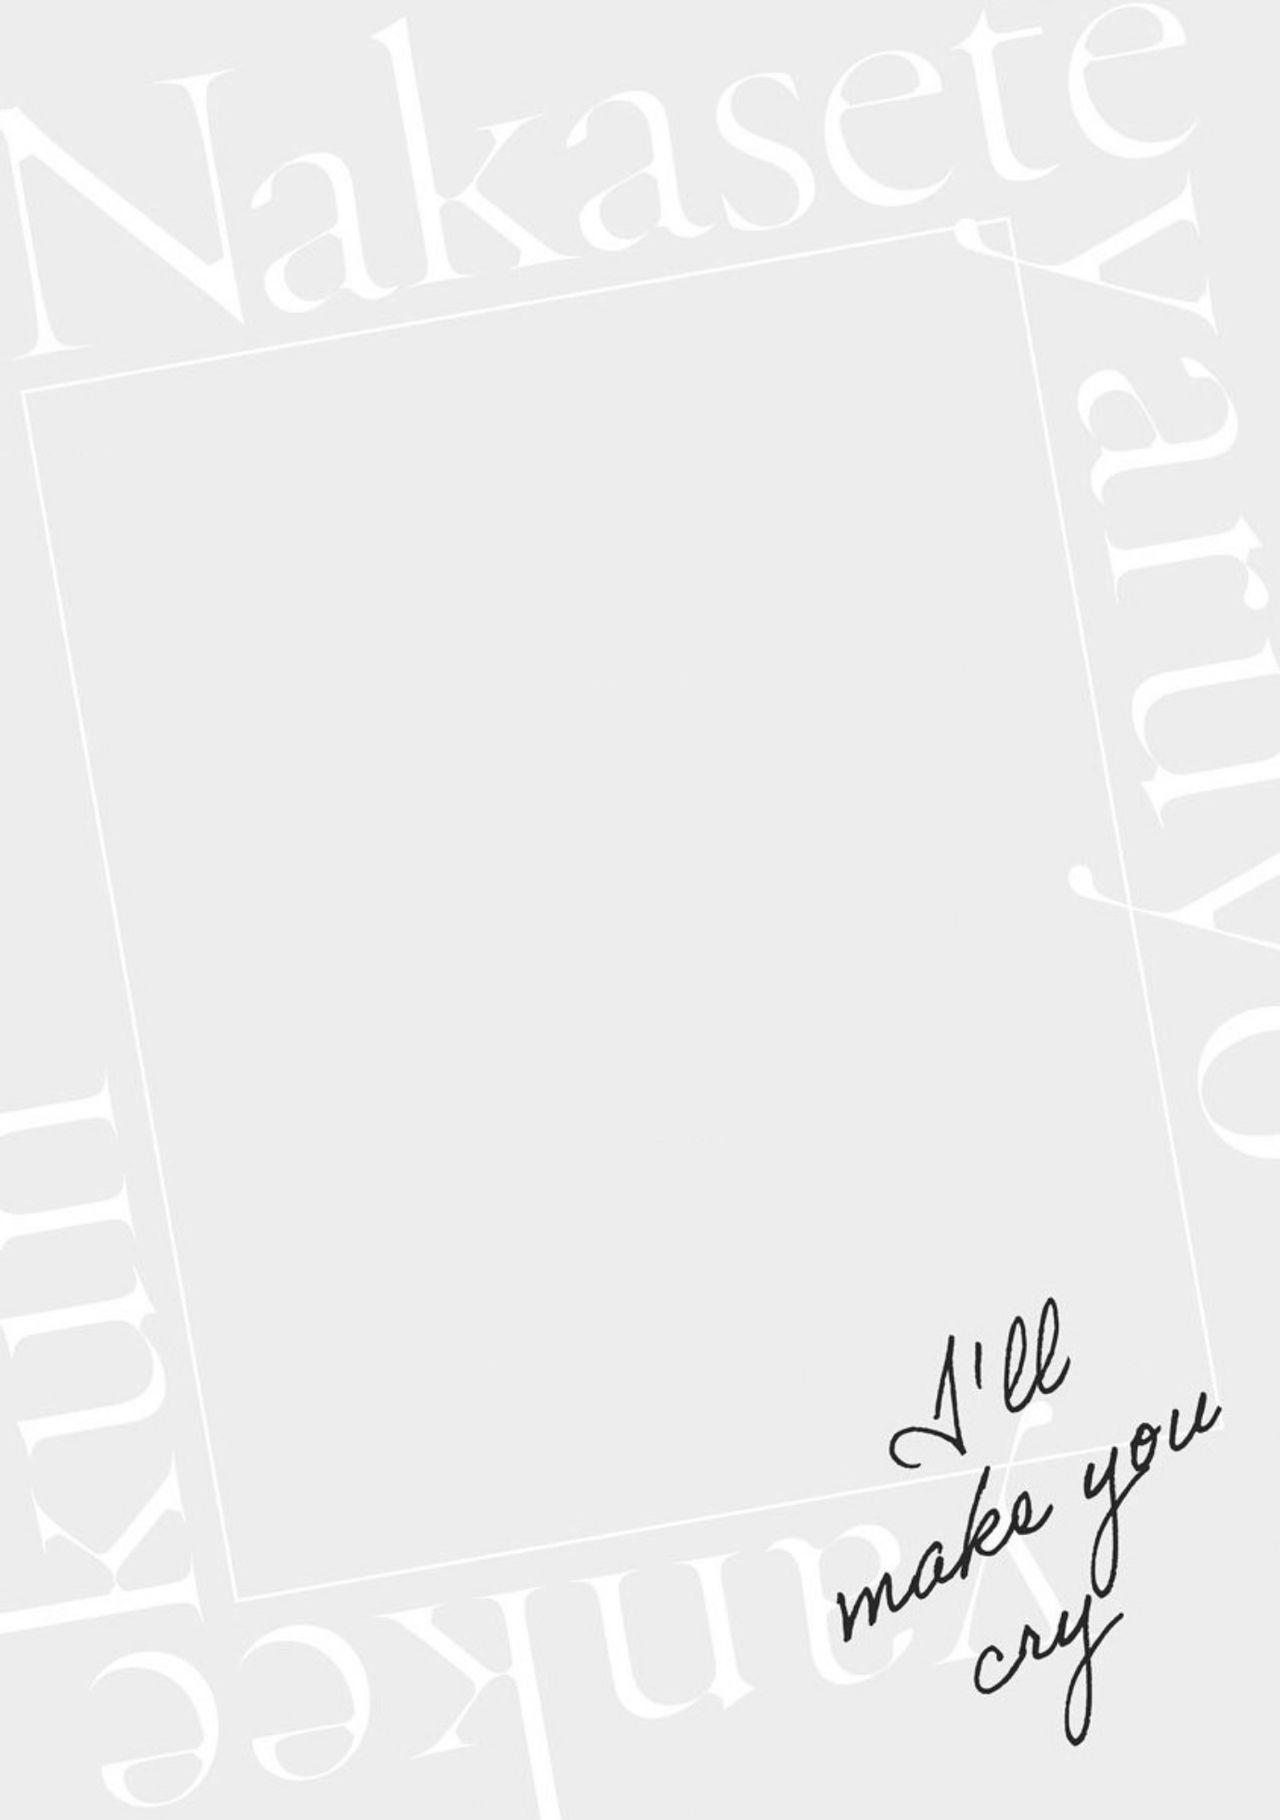 [Hiiragi Nozomu] Nakasete Yaru yo Yankee-kun   I'll Make You Cry Ch. 1-5 + Extras [English] [Digital] 46